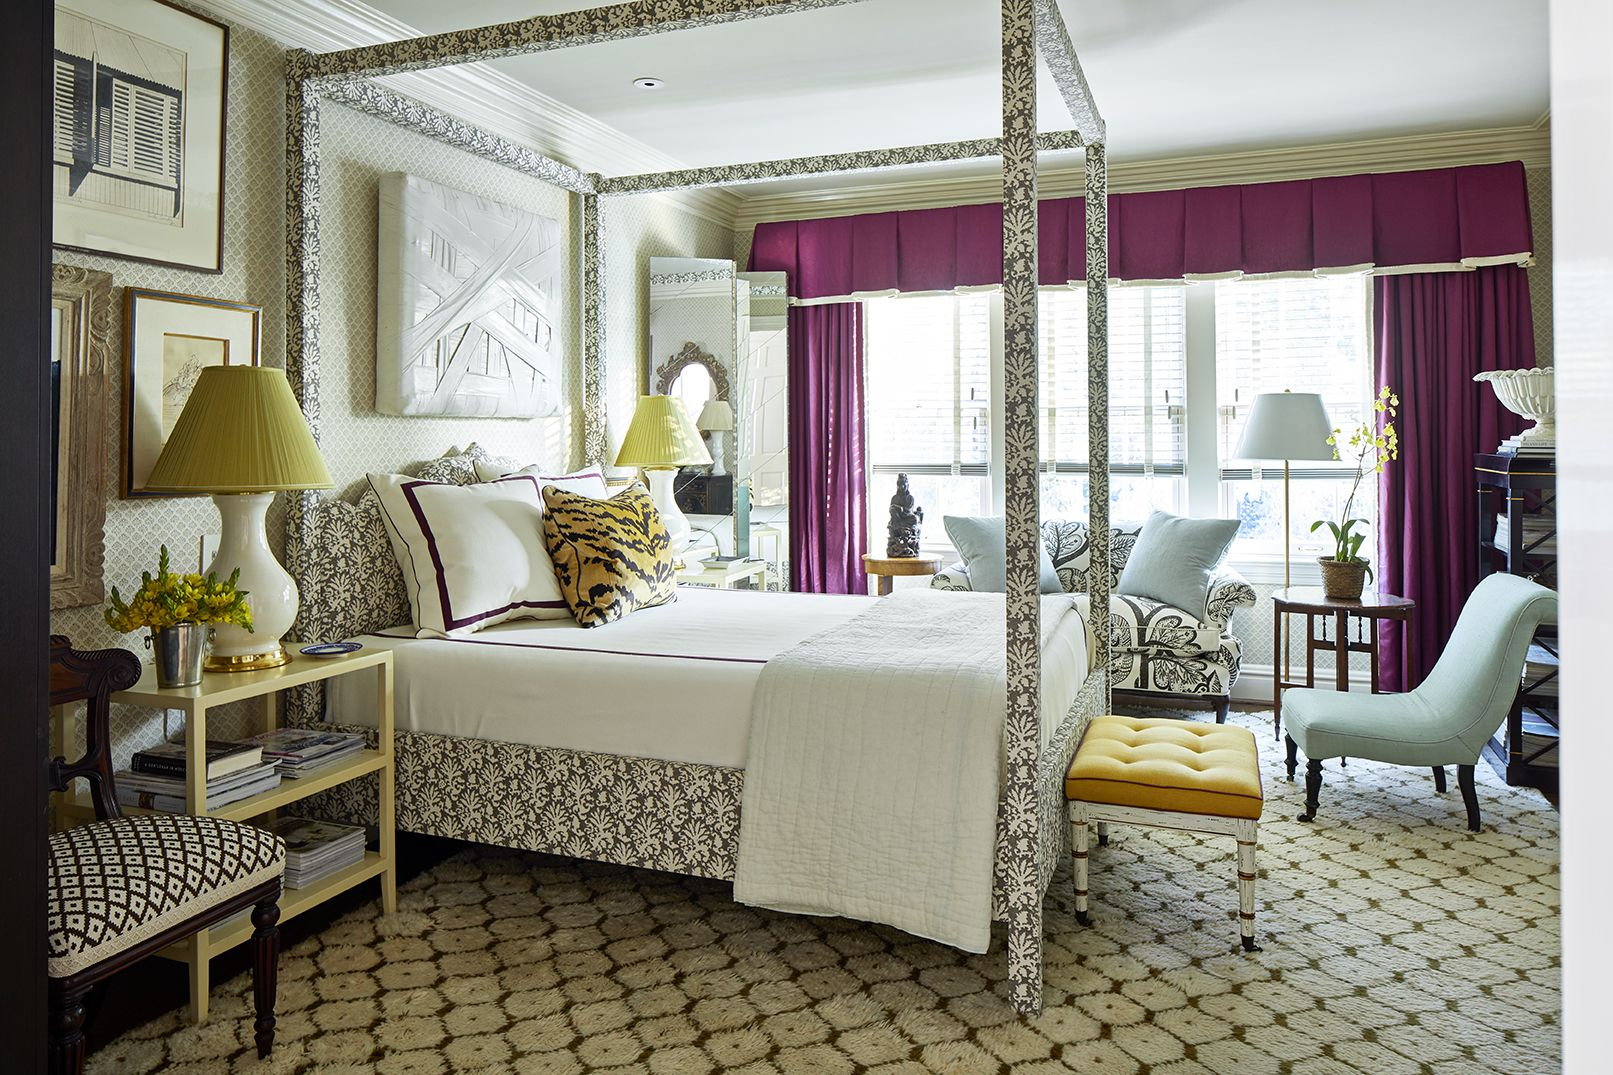 Large Bedroom Interior Design Eclectic master bedroom ideas